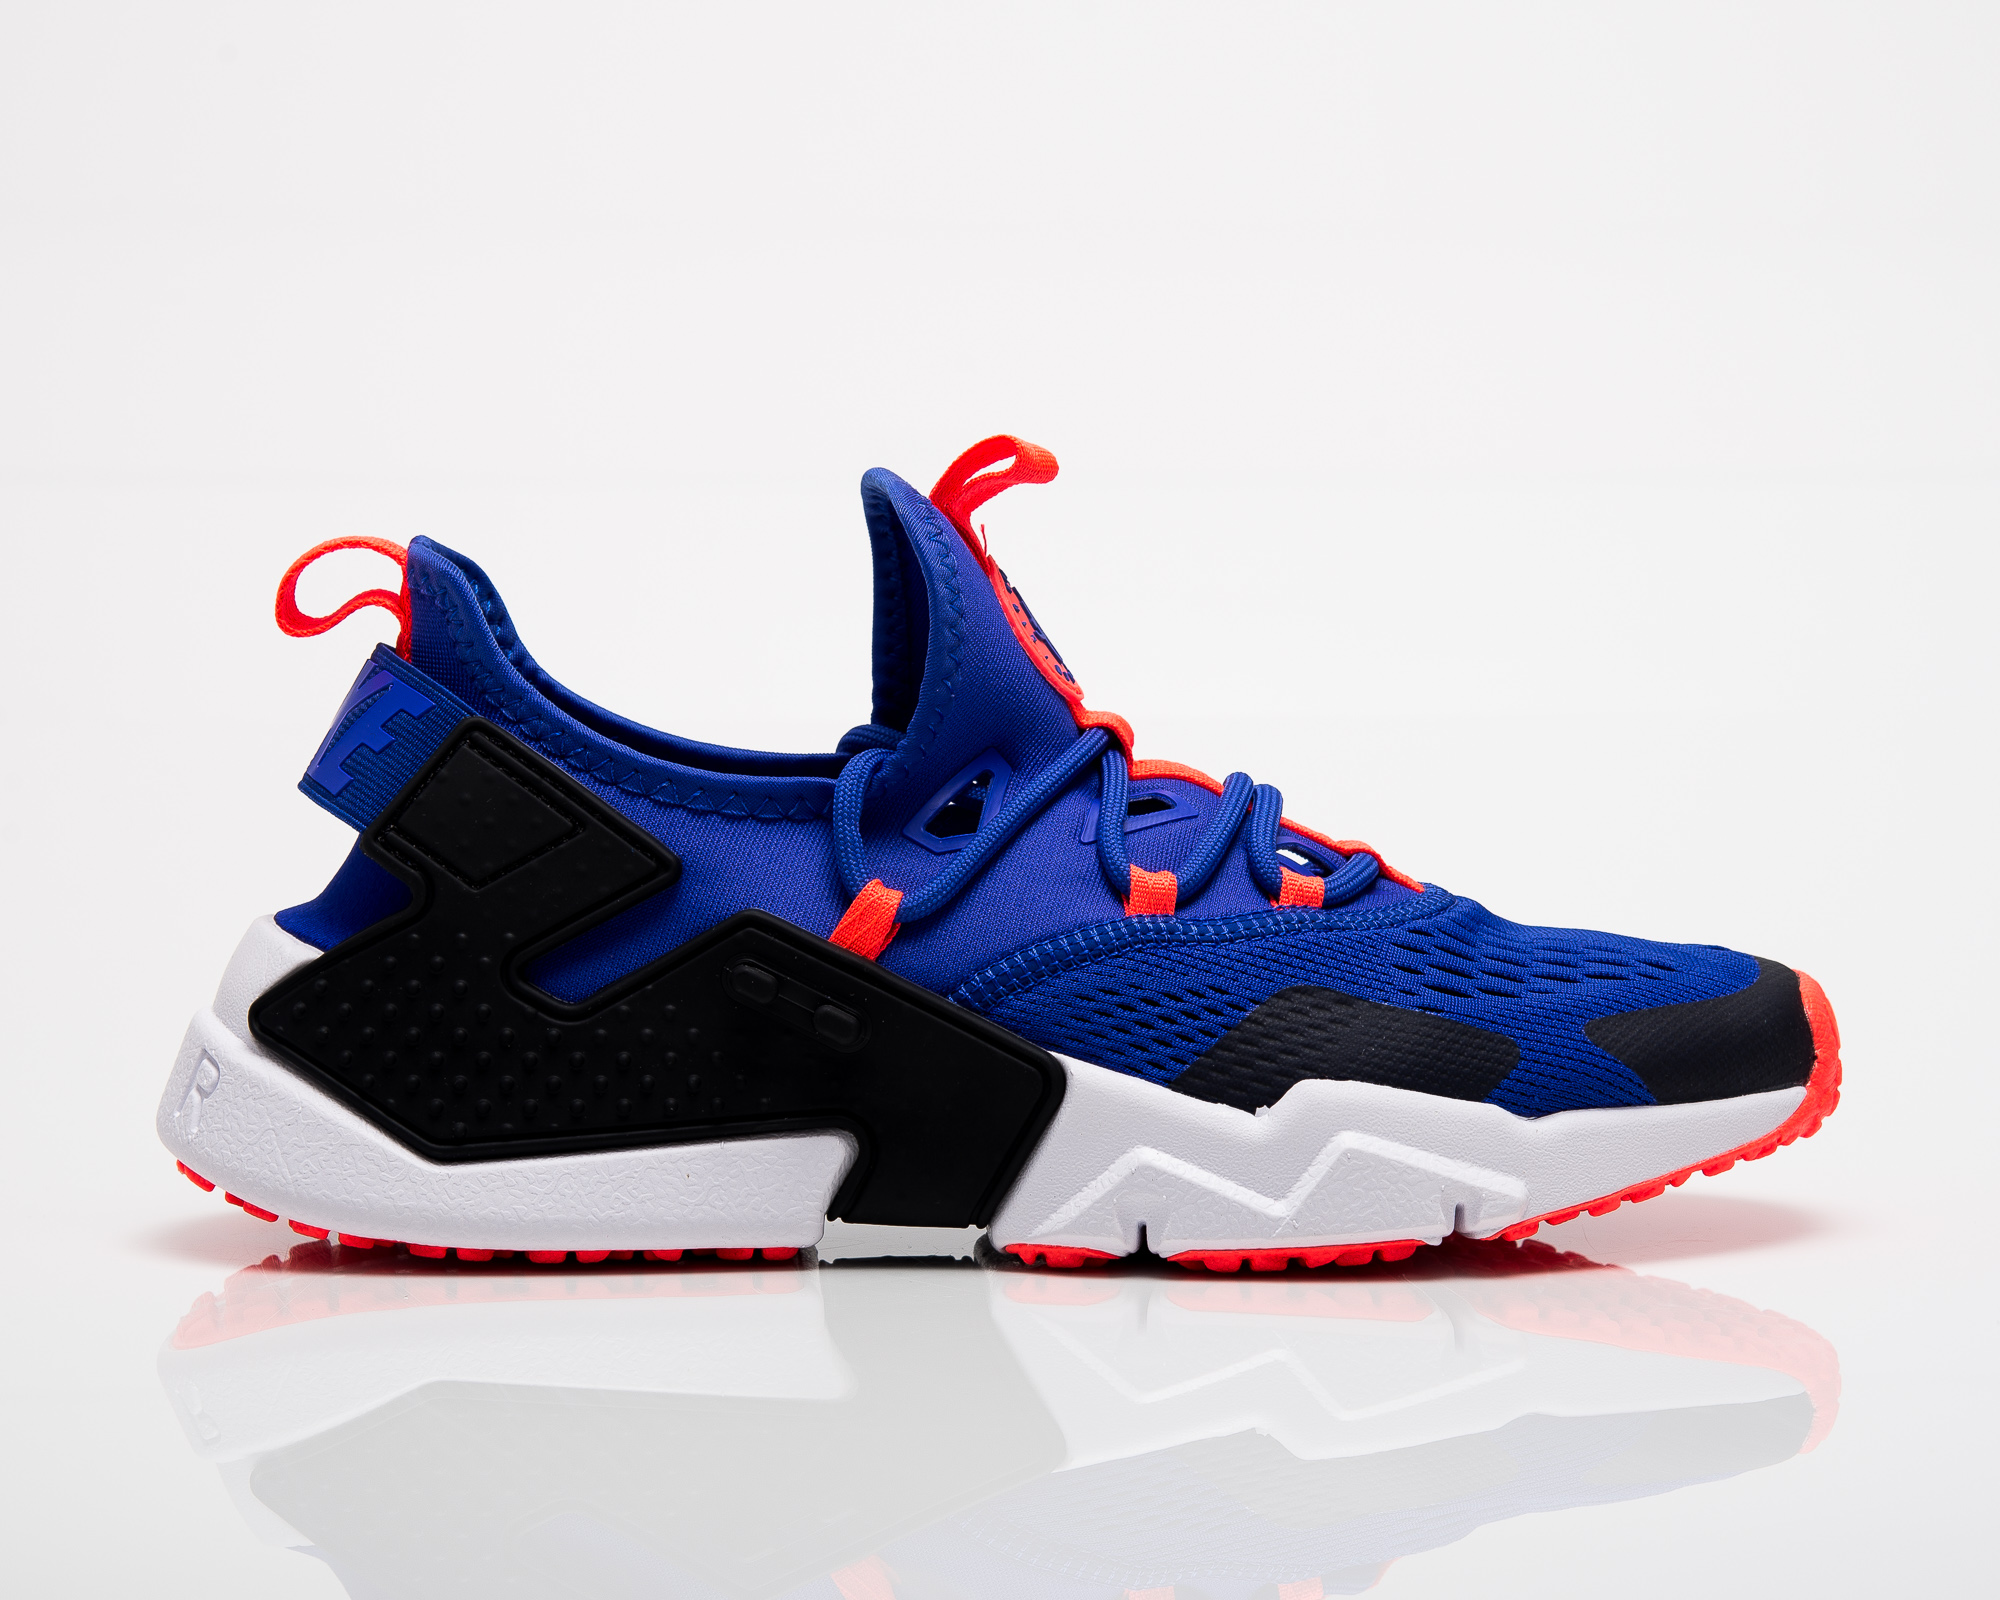 Nike Air Huarache Drift Breathe - Shoes Casual - Sporting goods  9e11e9e80